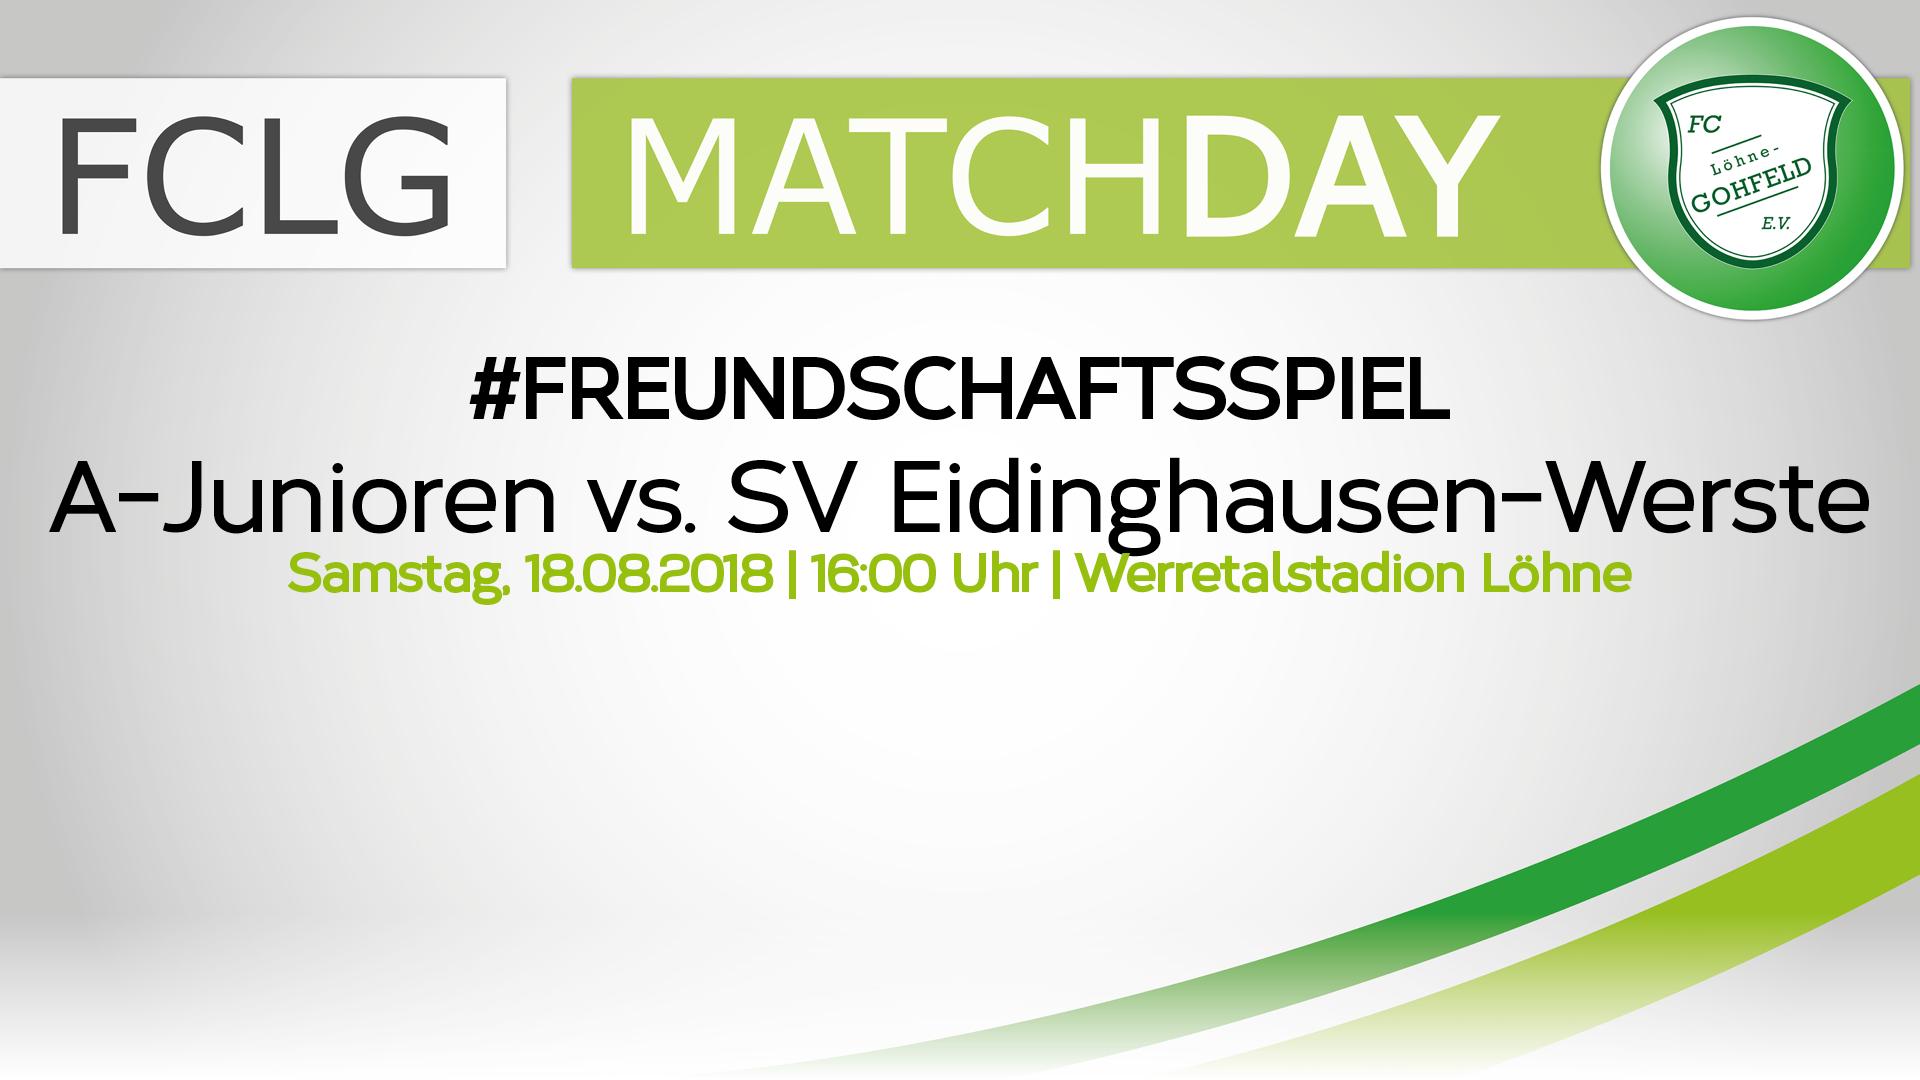 A-Junioren vs. SV Eidinghausen-Werste